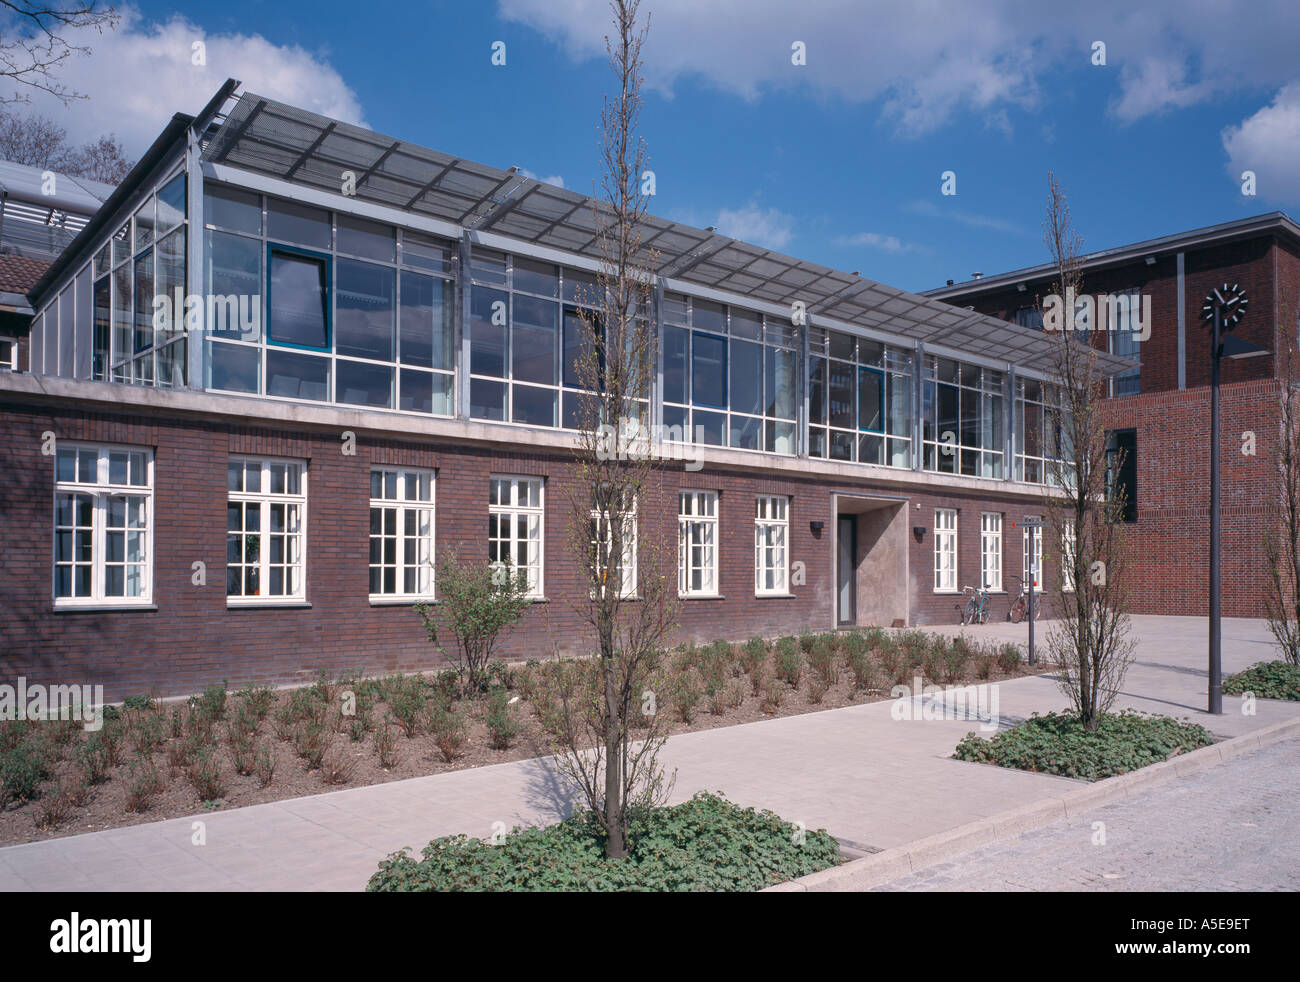 Gelsenkirchen, ehemalige Zeche Nordstern, Umbau zur BUGA 97, ehemalige Lohnhalle Stock Photo